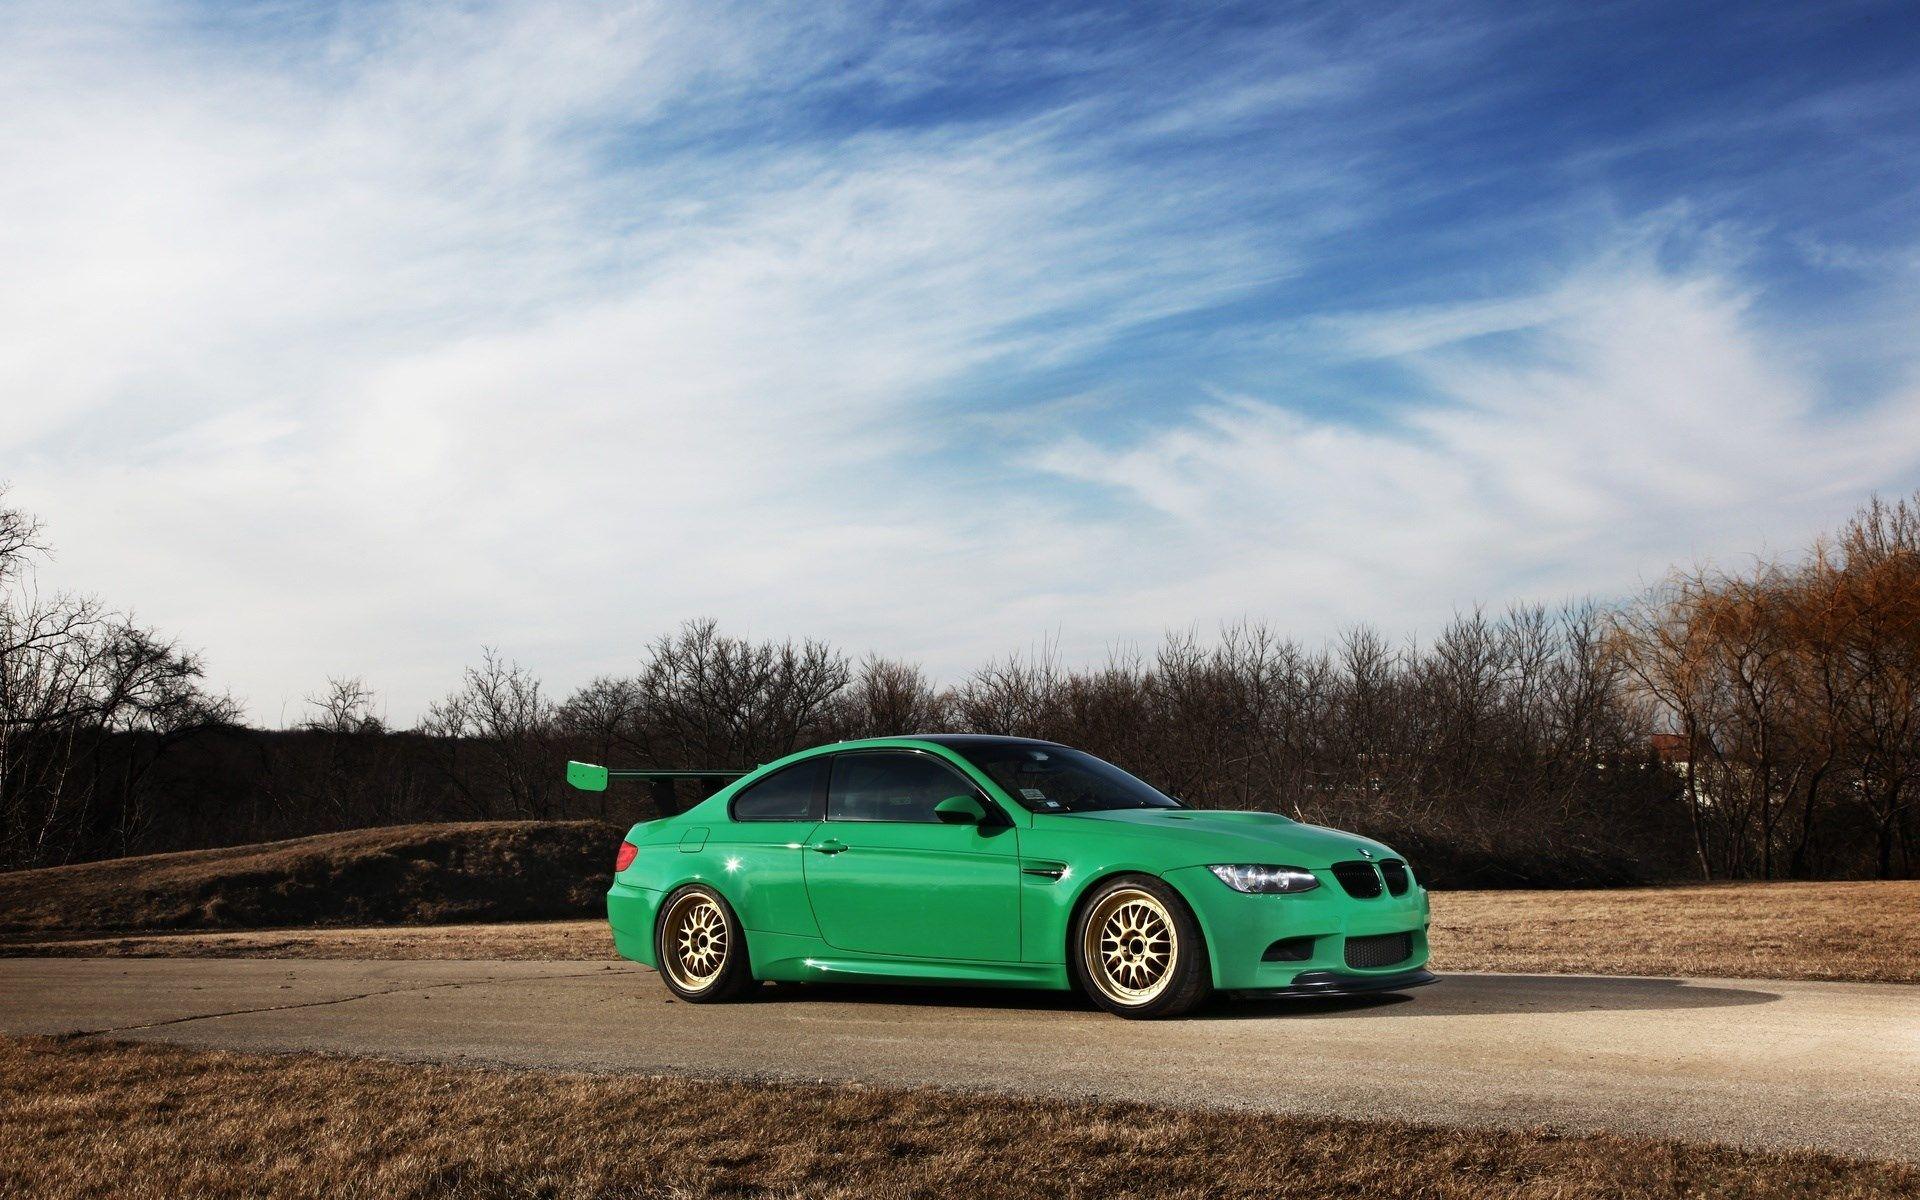 High Resolution Wallpaper Bmw Racing Rims Bmw Cars Cars Racing